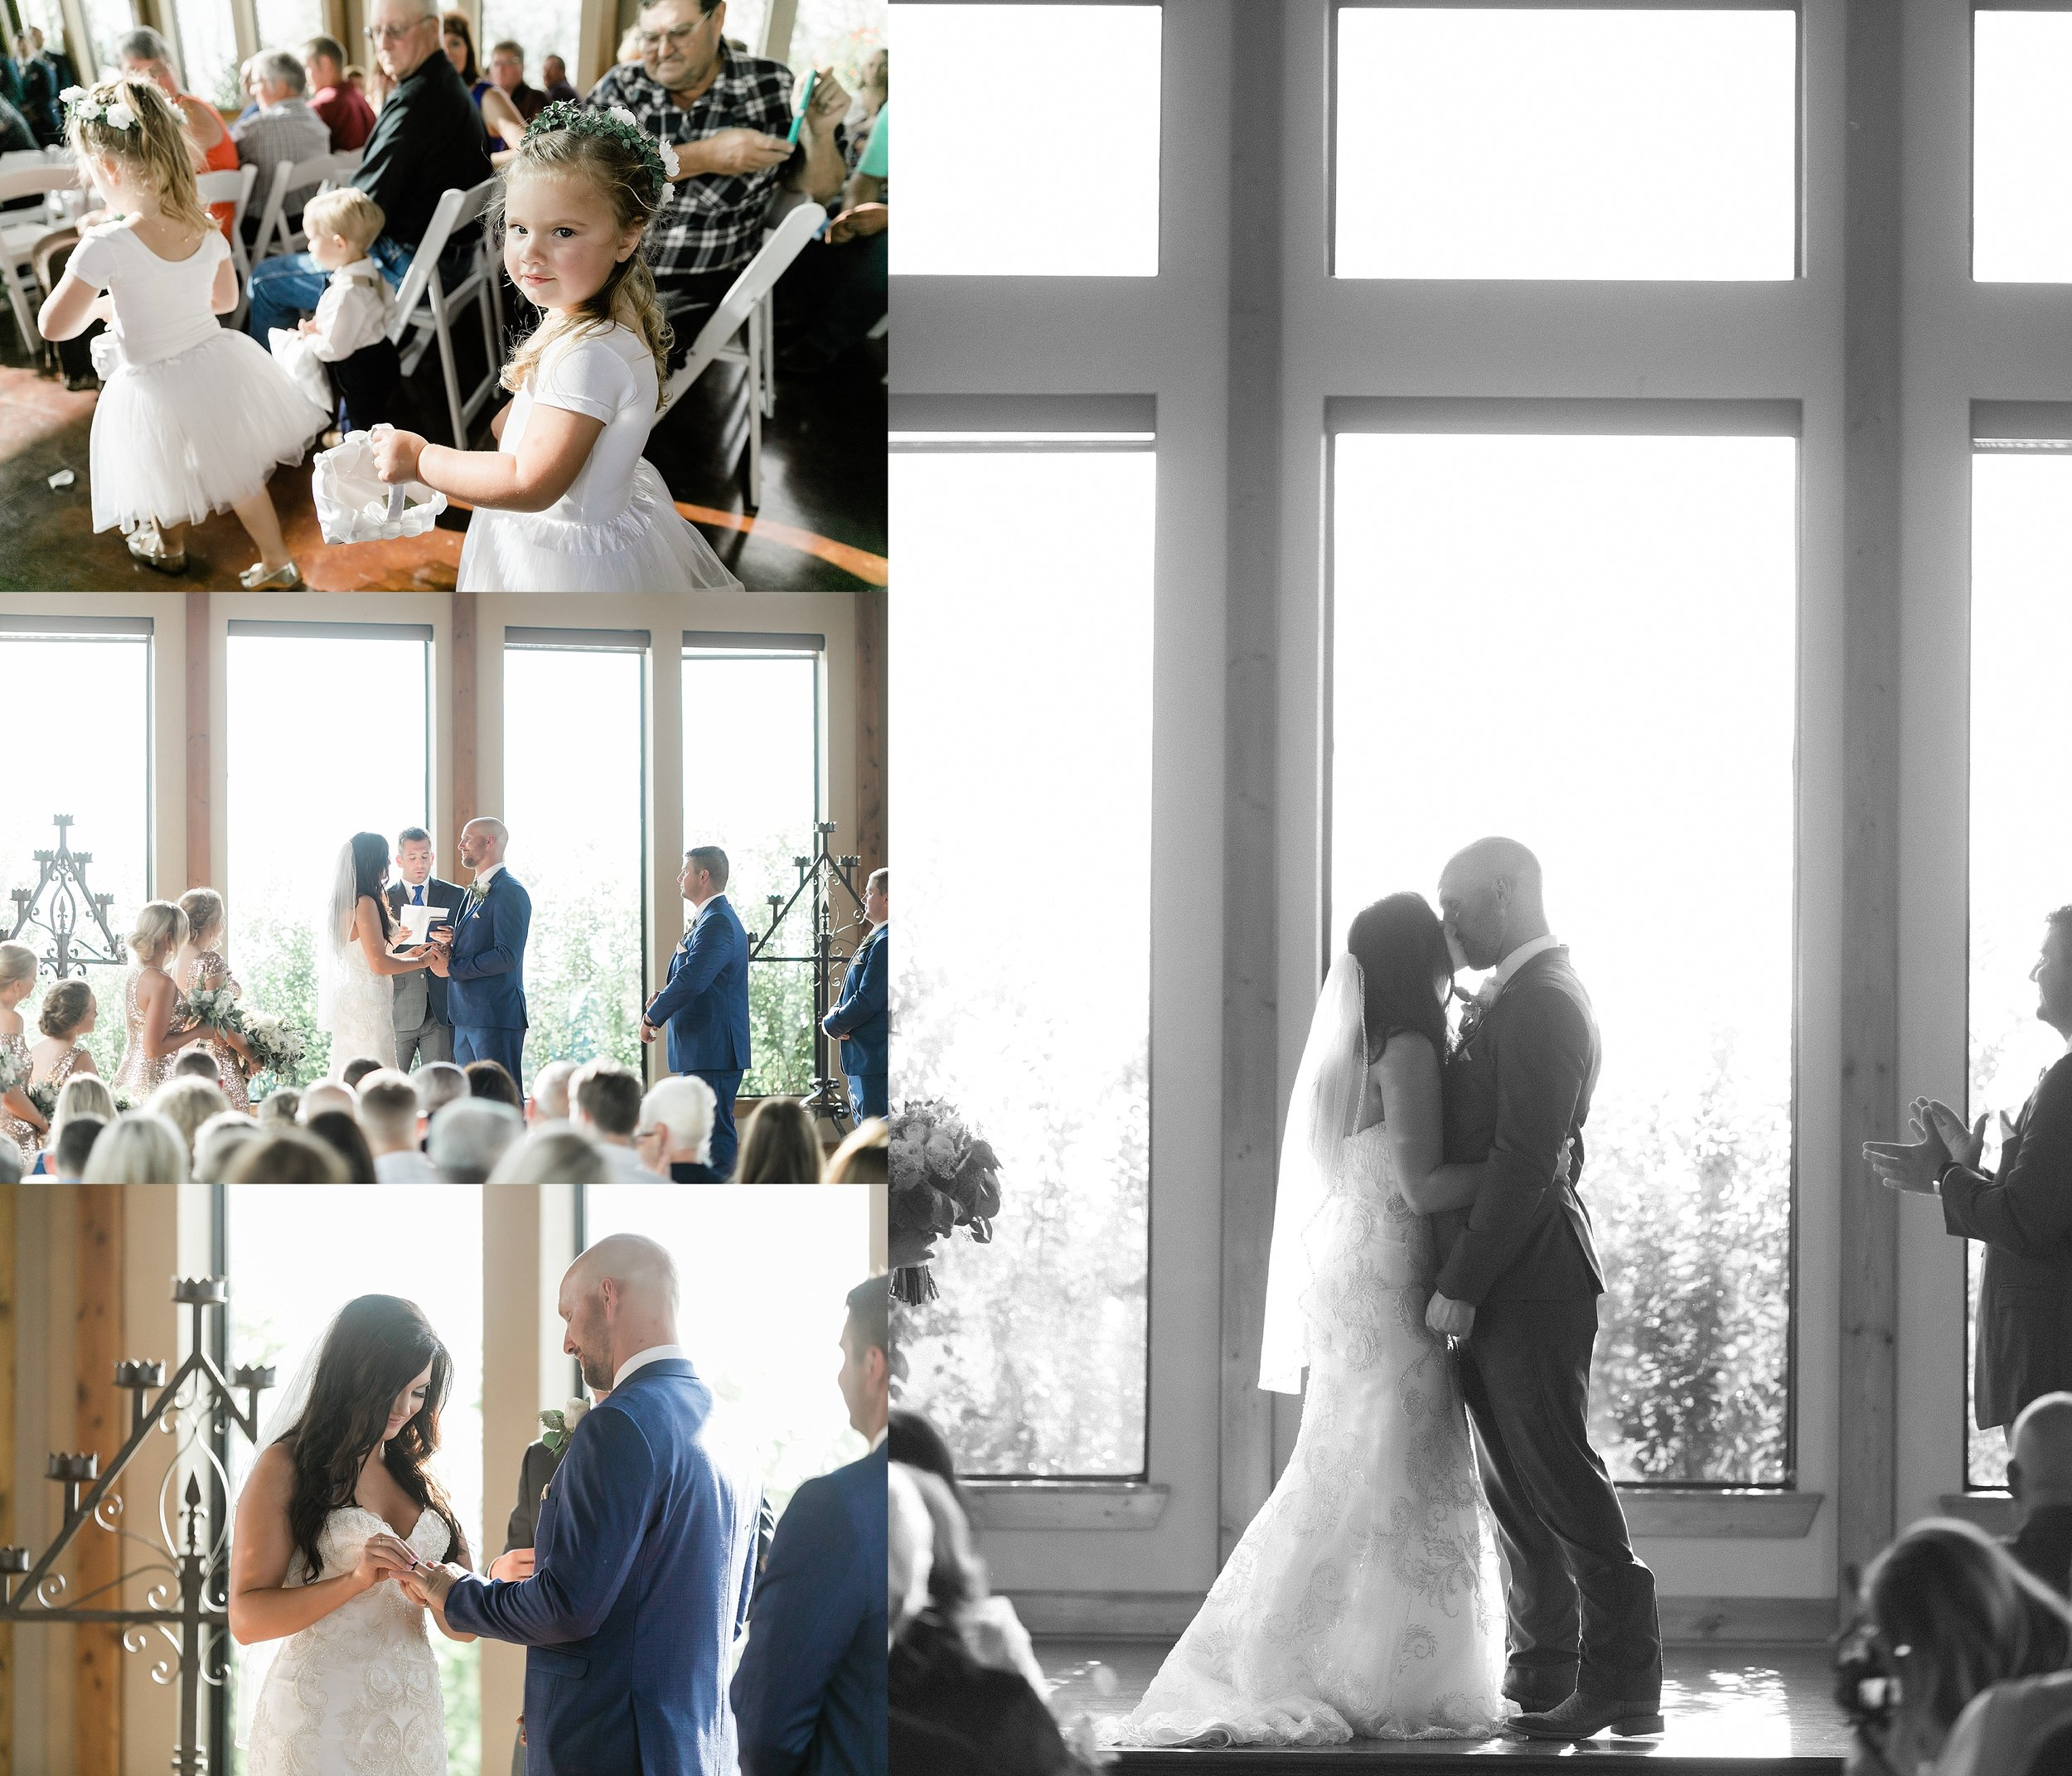 bailey-and-carl-coyote-ranch-resort-wedding-photographer-wichita-falls-texas-destination-wedding-0020.jpg